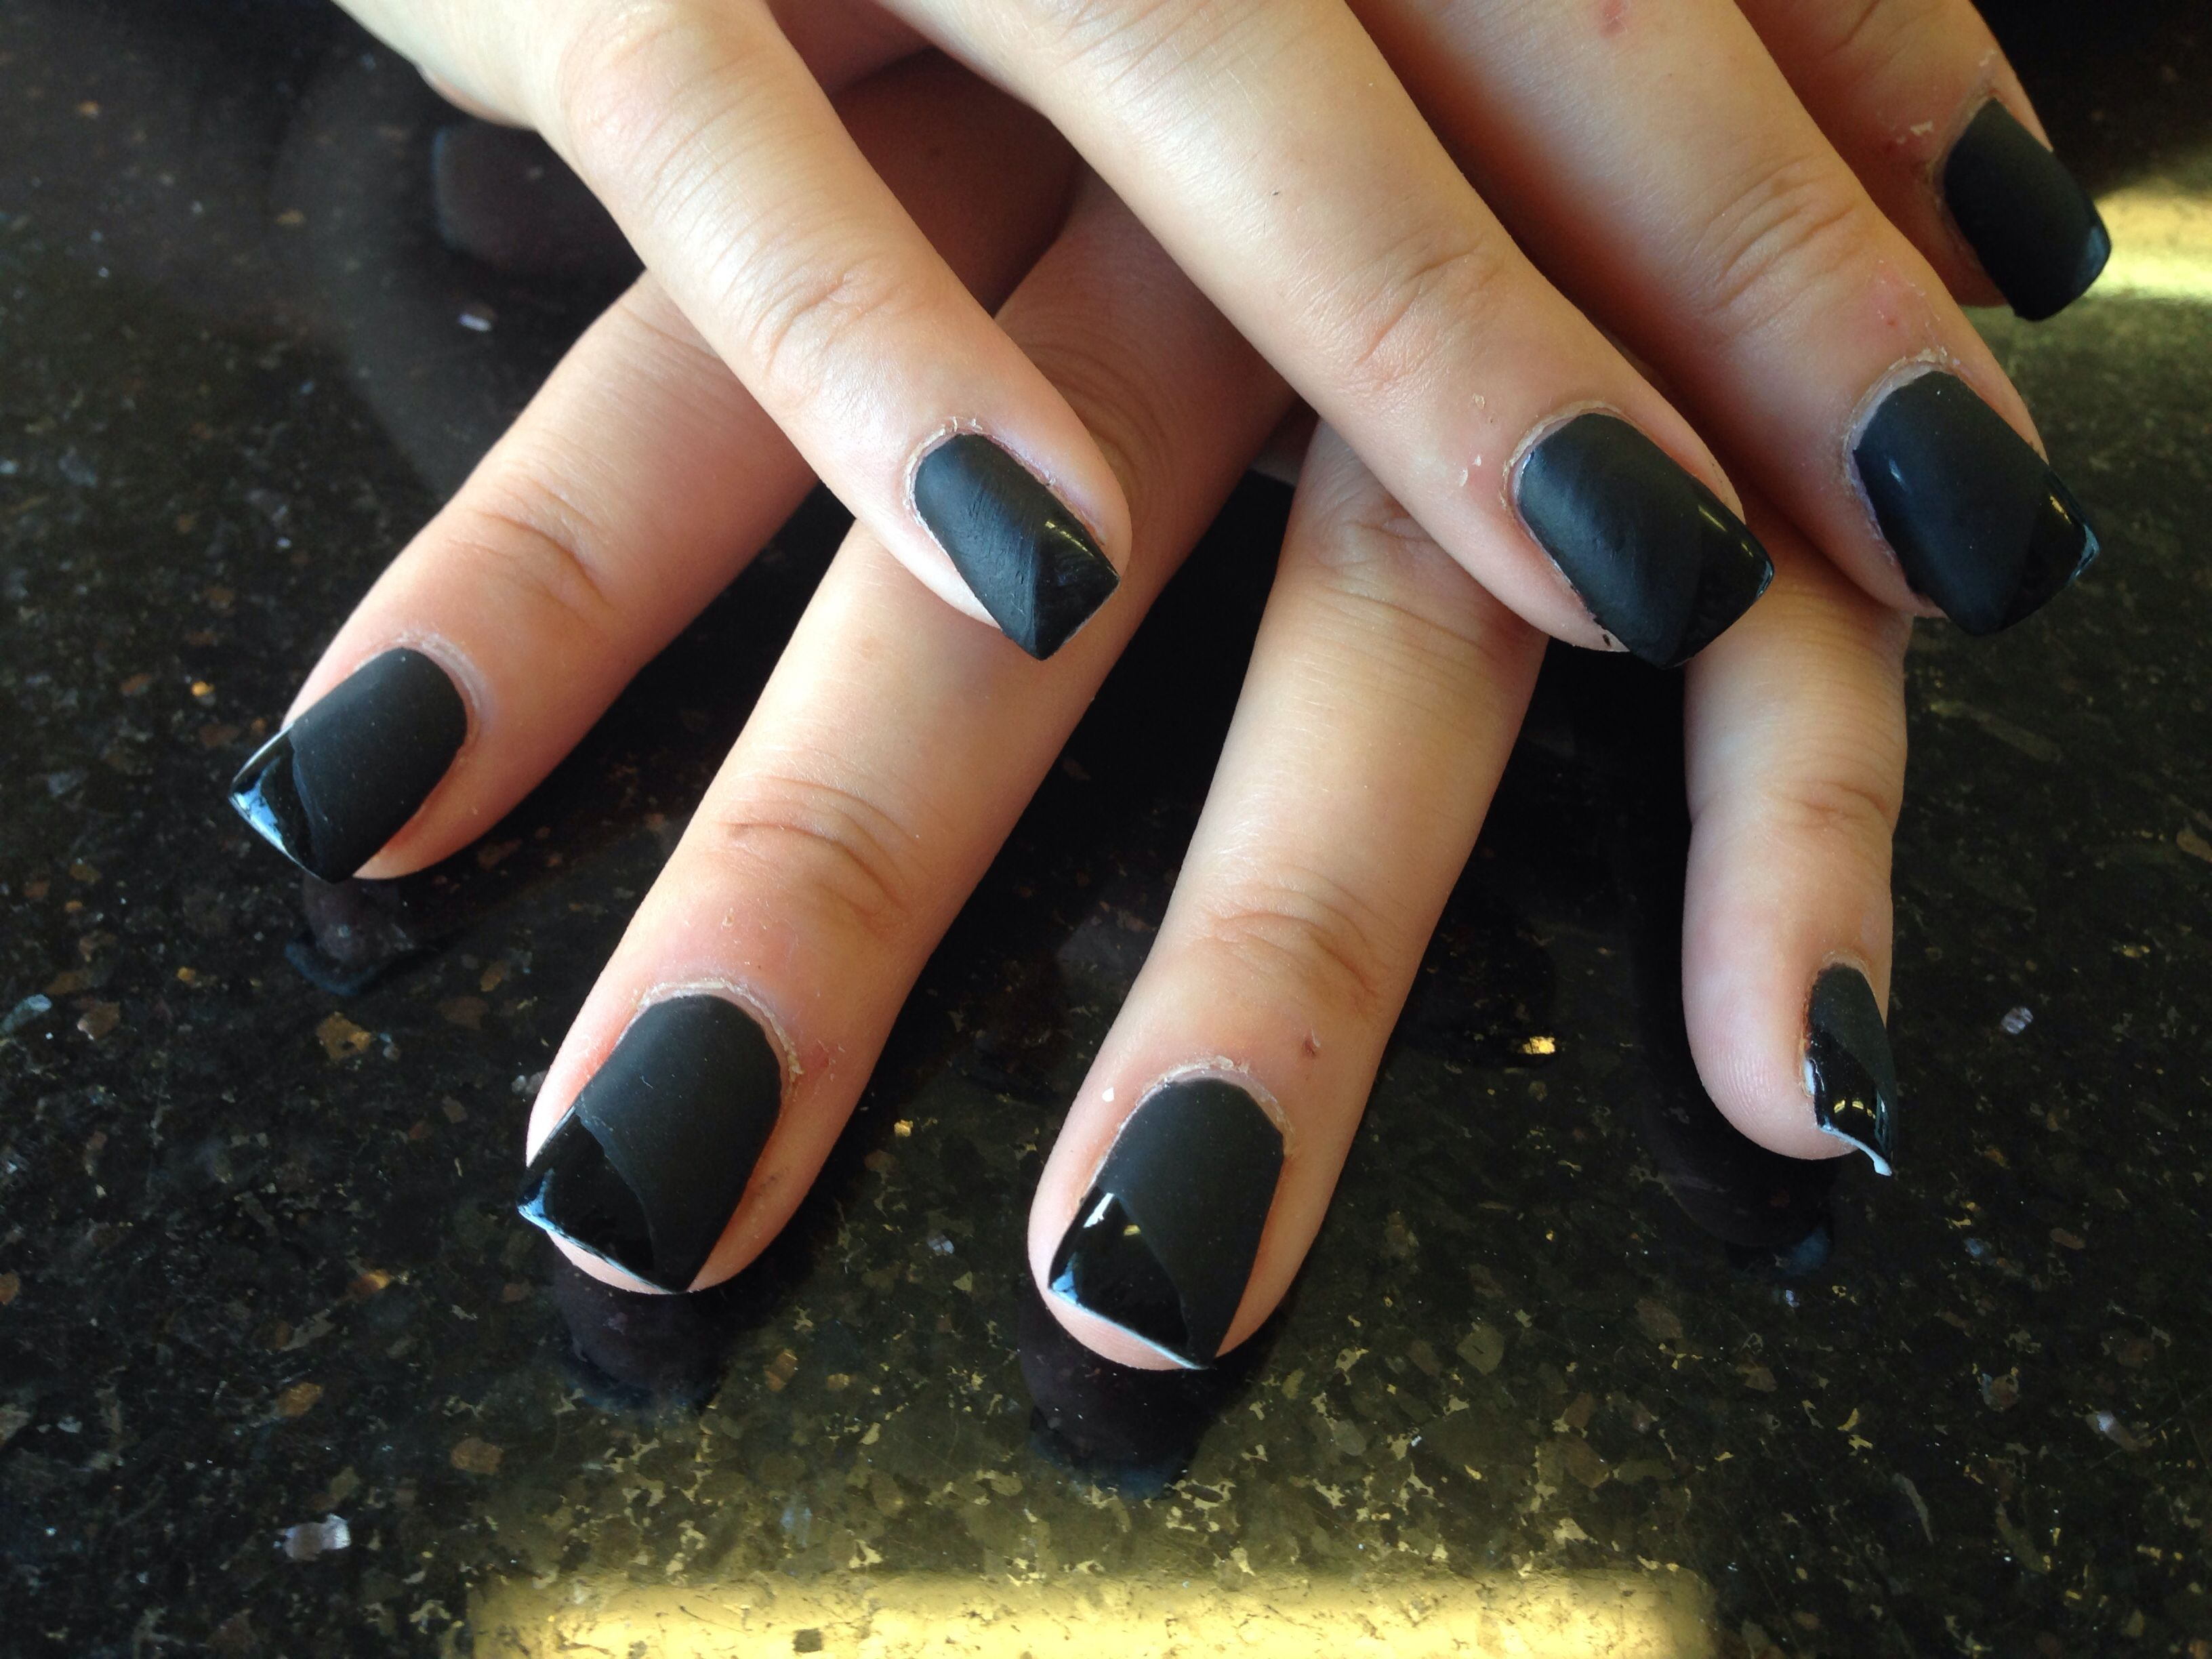 Central BC\'s Academy of Nail Technology   Nails nails and more nails ...